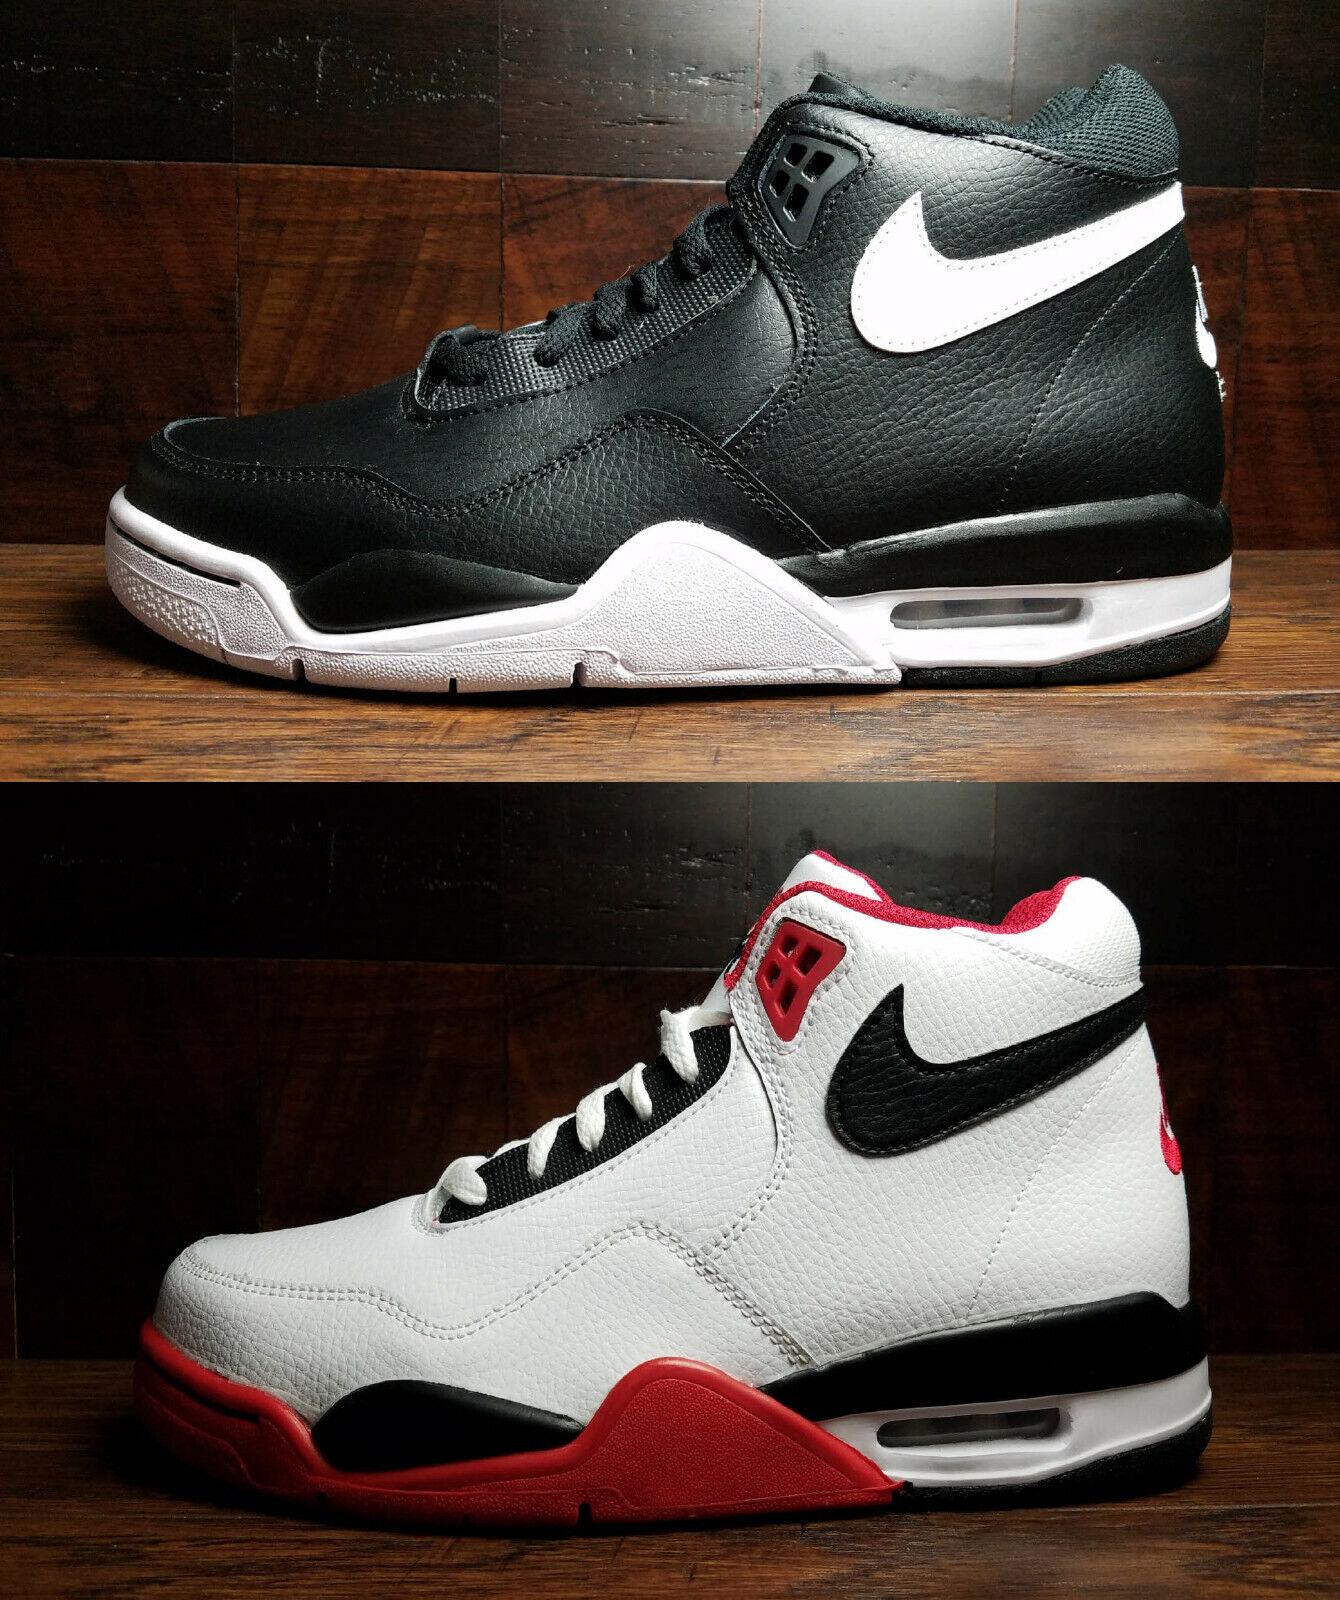 Nike Air Flight Legacy Mens Retro High Top Basketball Sneakers BQ4212 Sz  7.5-13